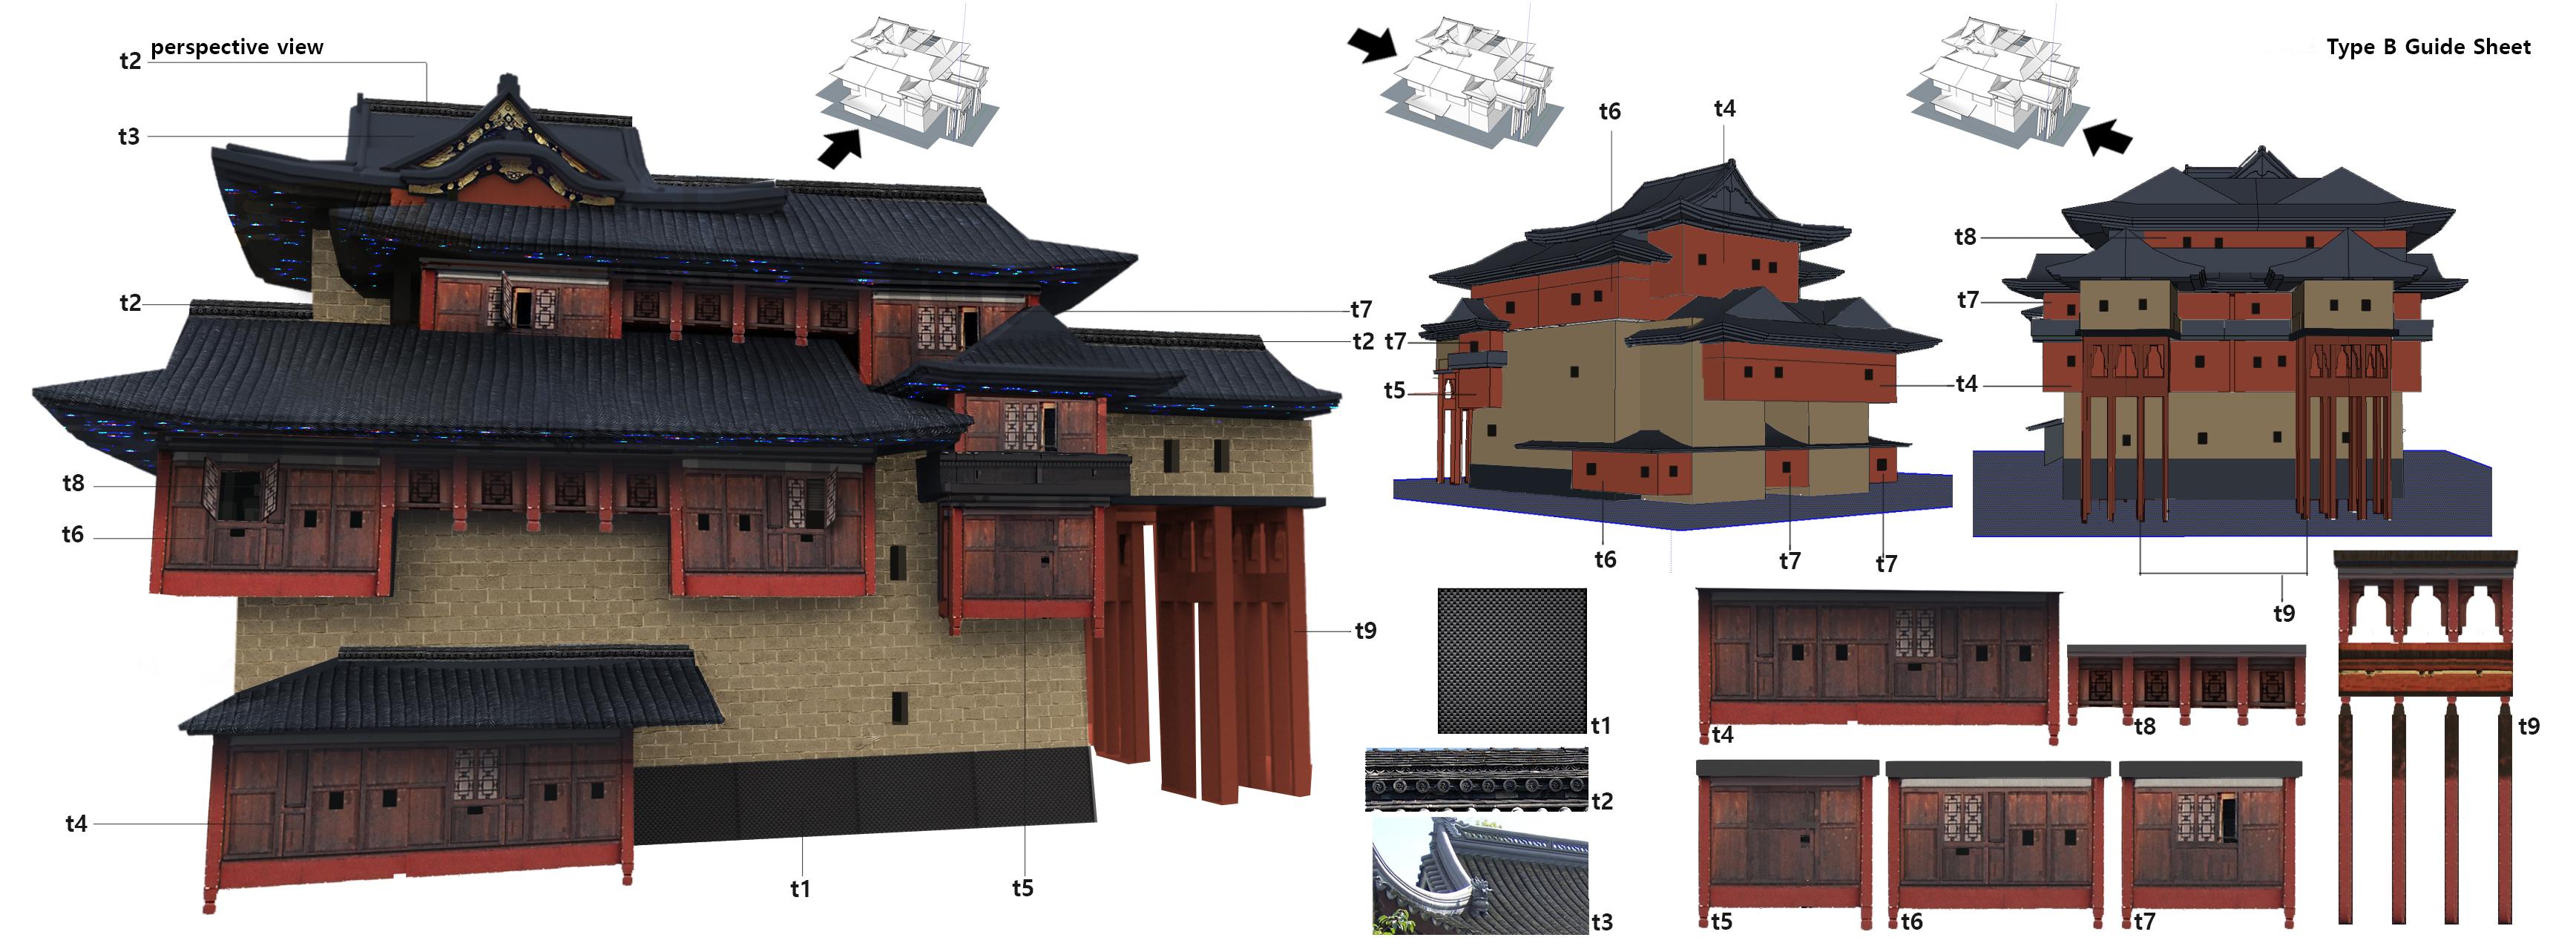 sinsi architecture  B